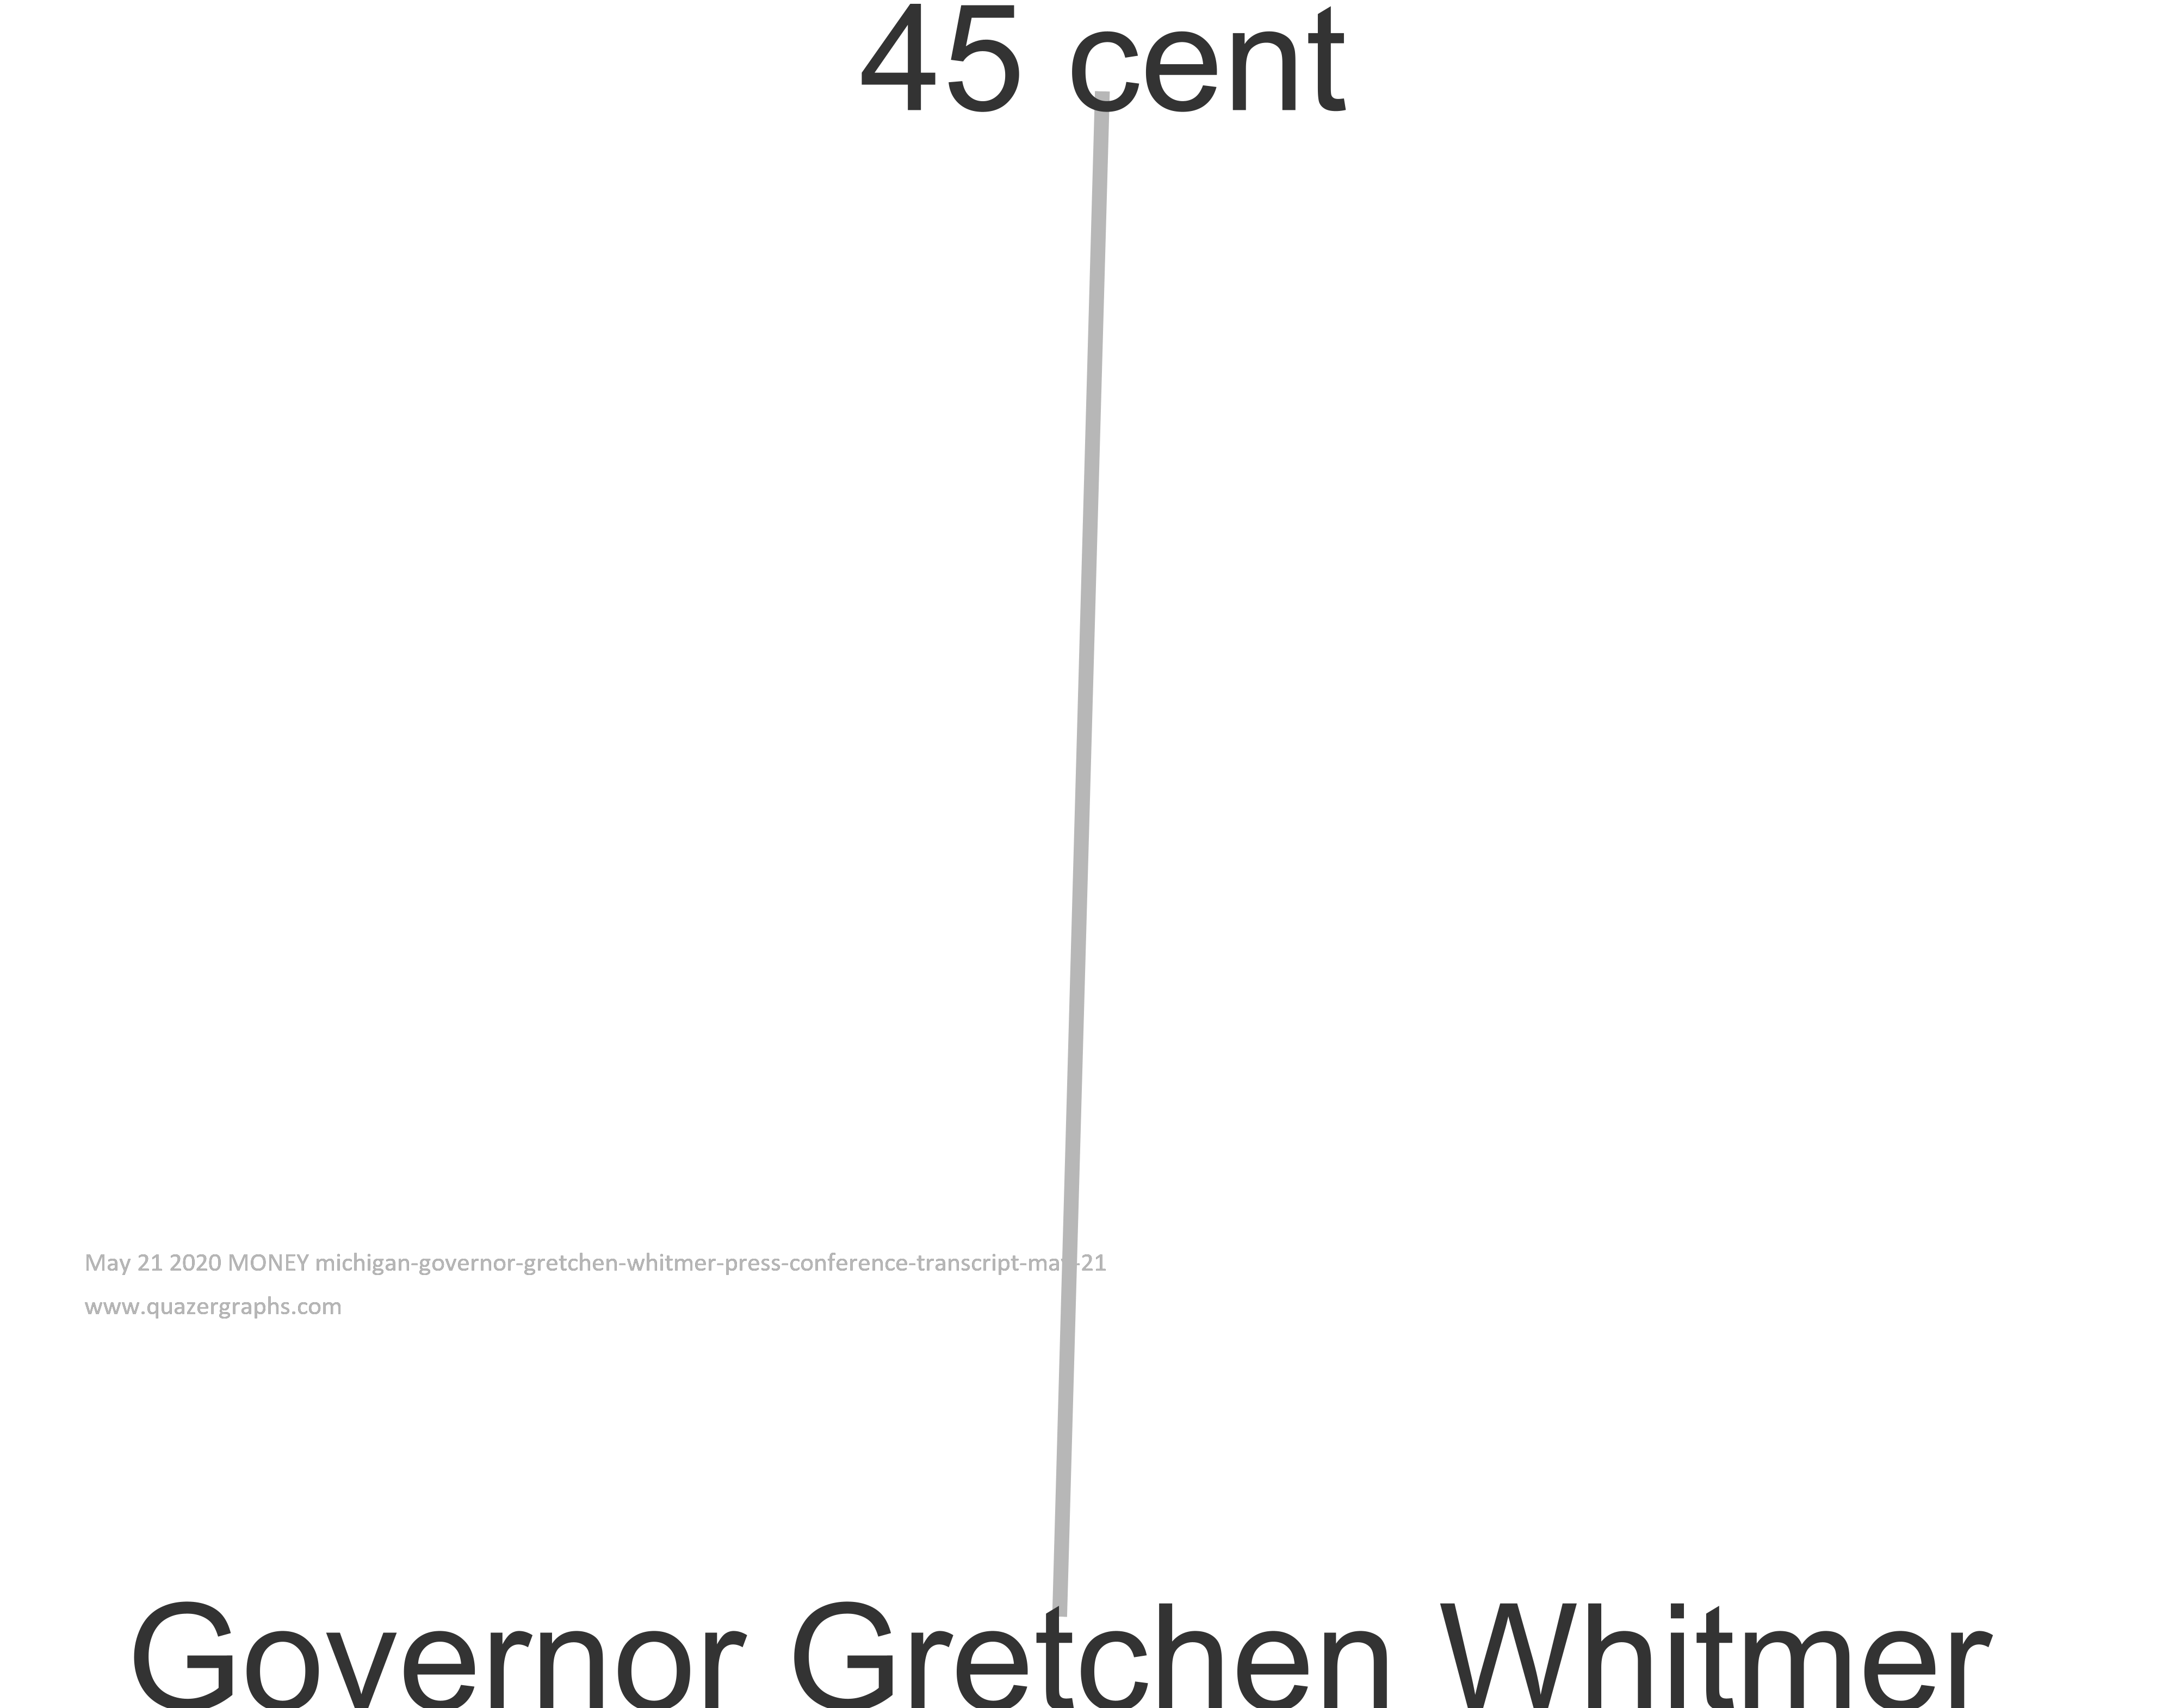 May 21 2020 MONEY michigan-governor-gretchen-whitmer-press-conference-transcript-may-21